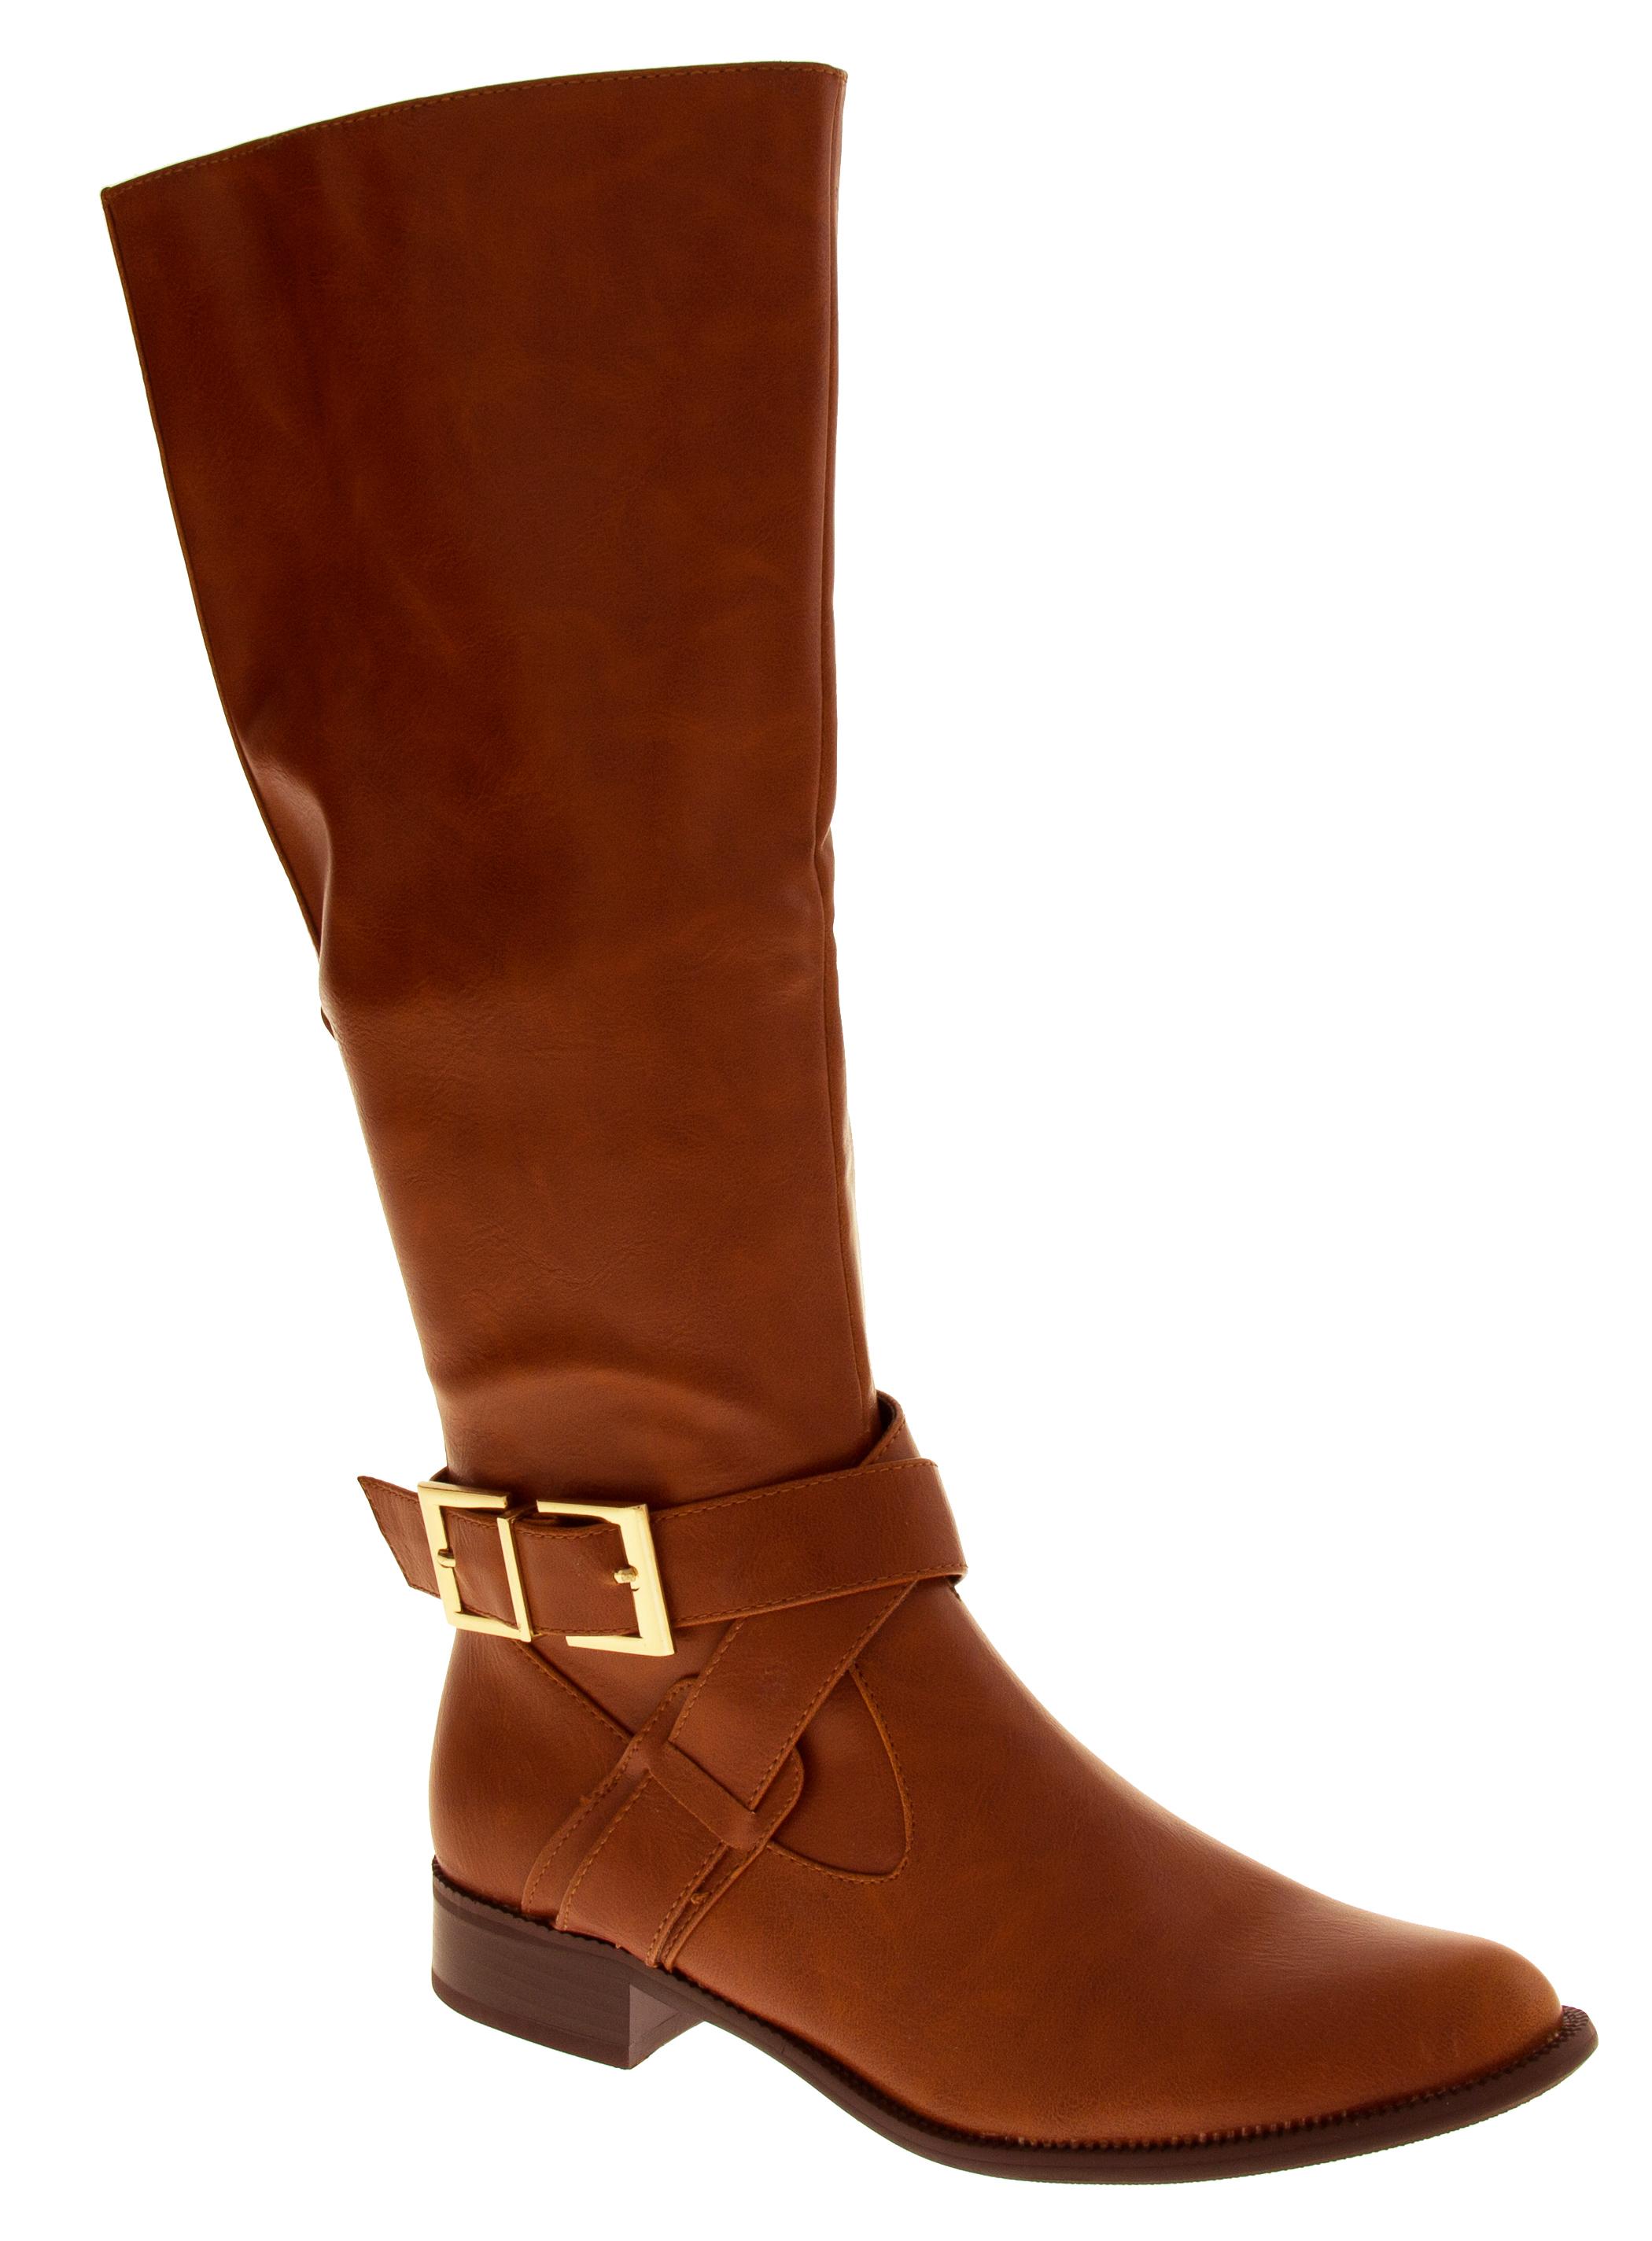 Womens Boots Low Heels Flat Knee High Work Boot Office Winter Sz Size 3 4